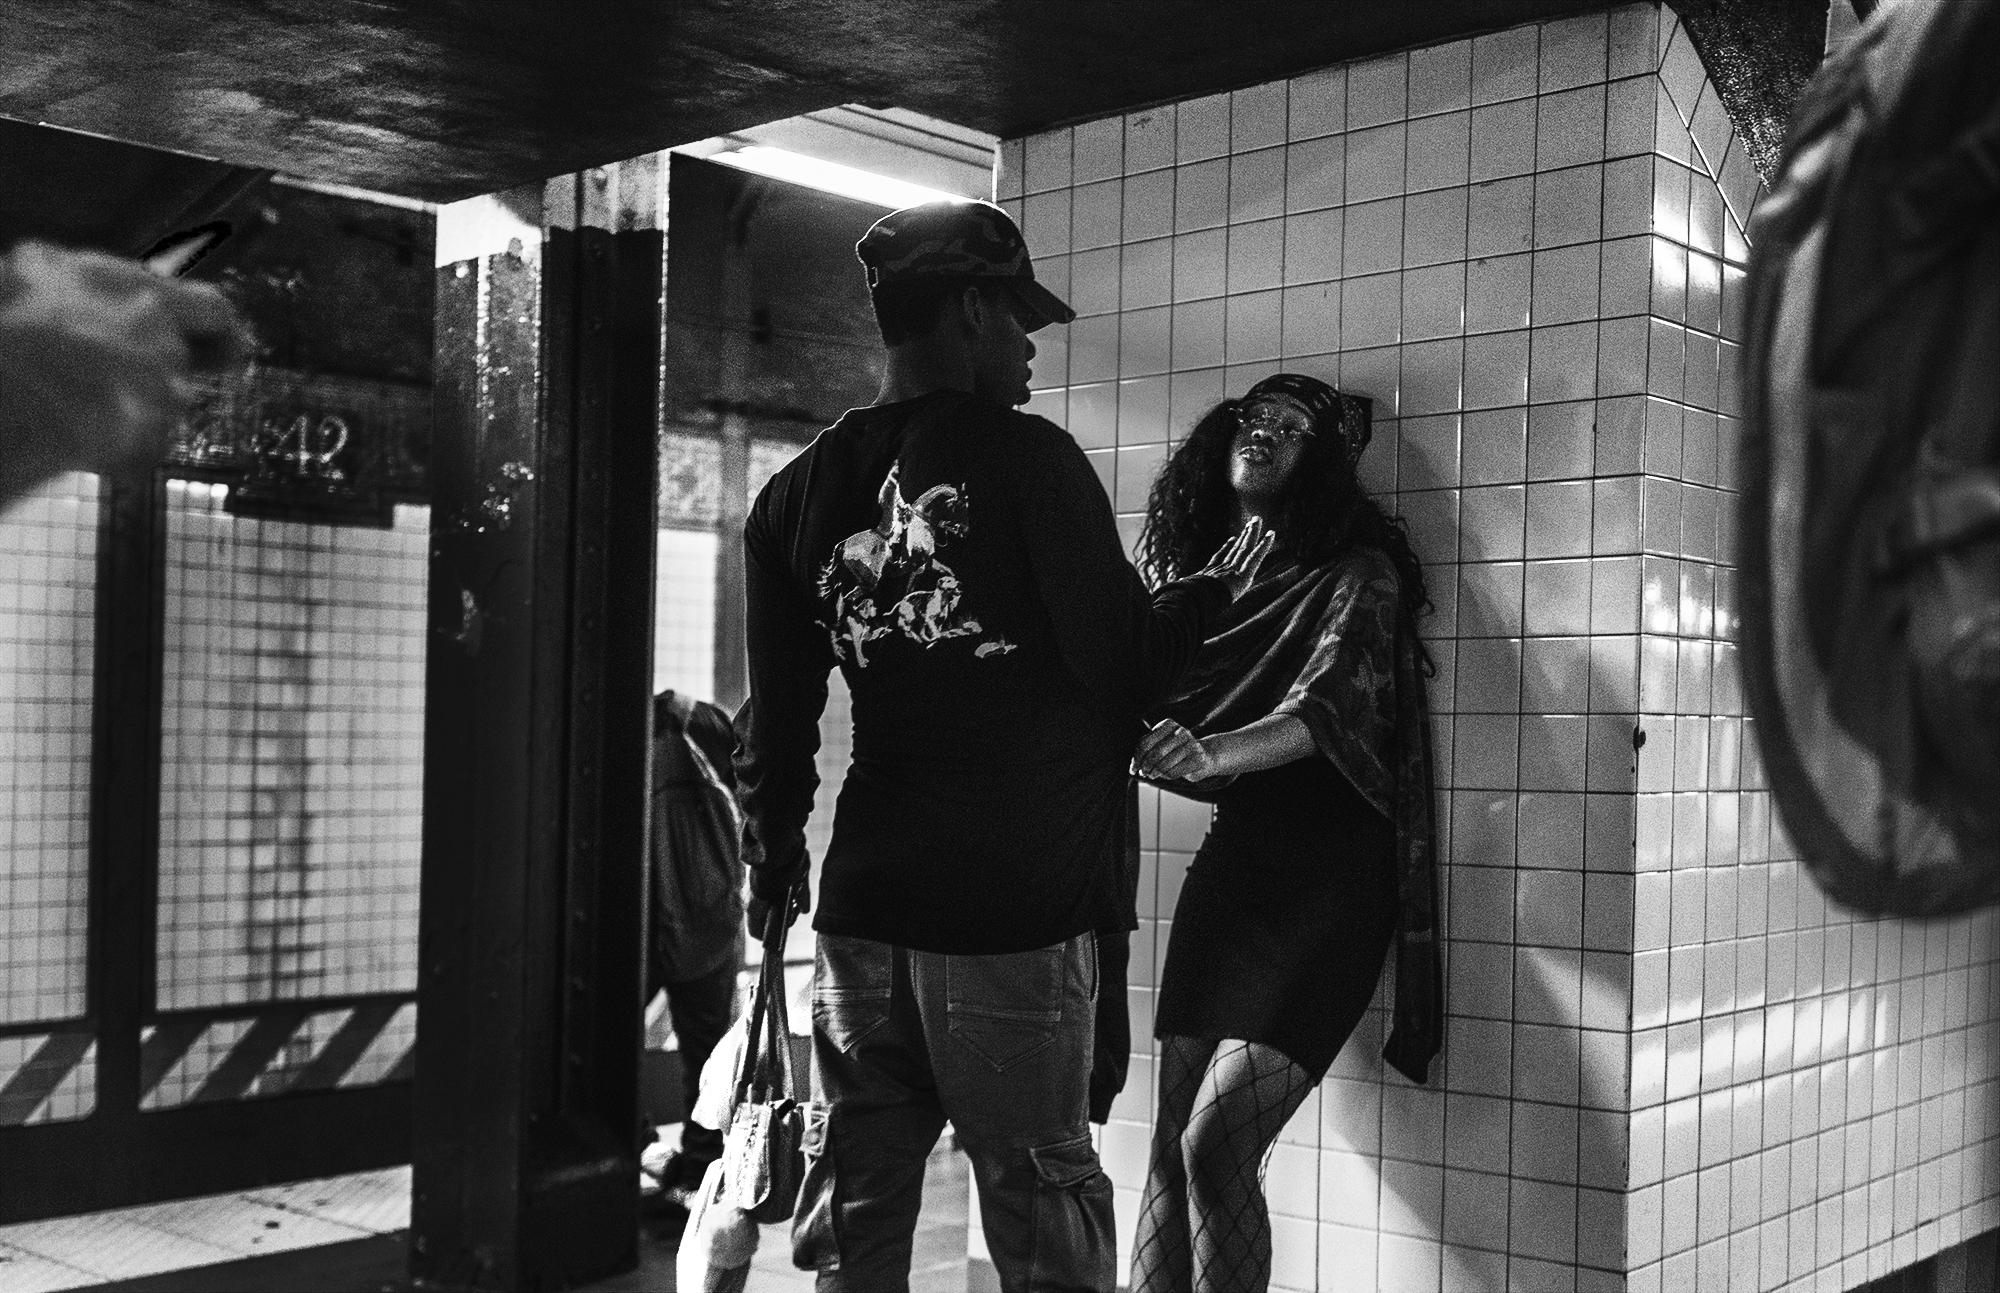 NYC_Subway_Young_Lovers_2017-005.jpg